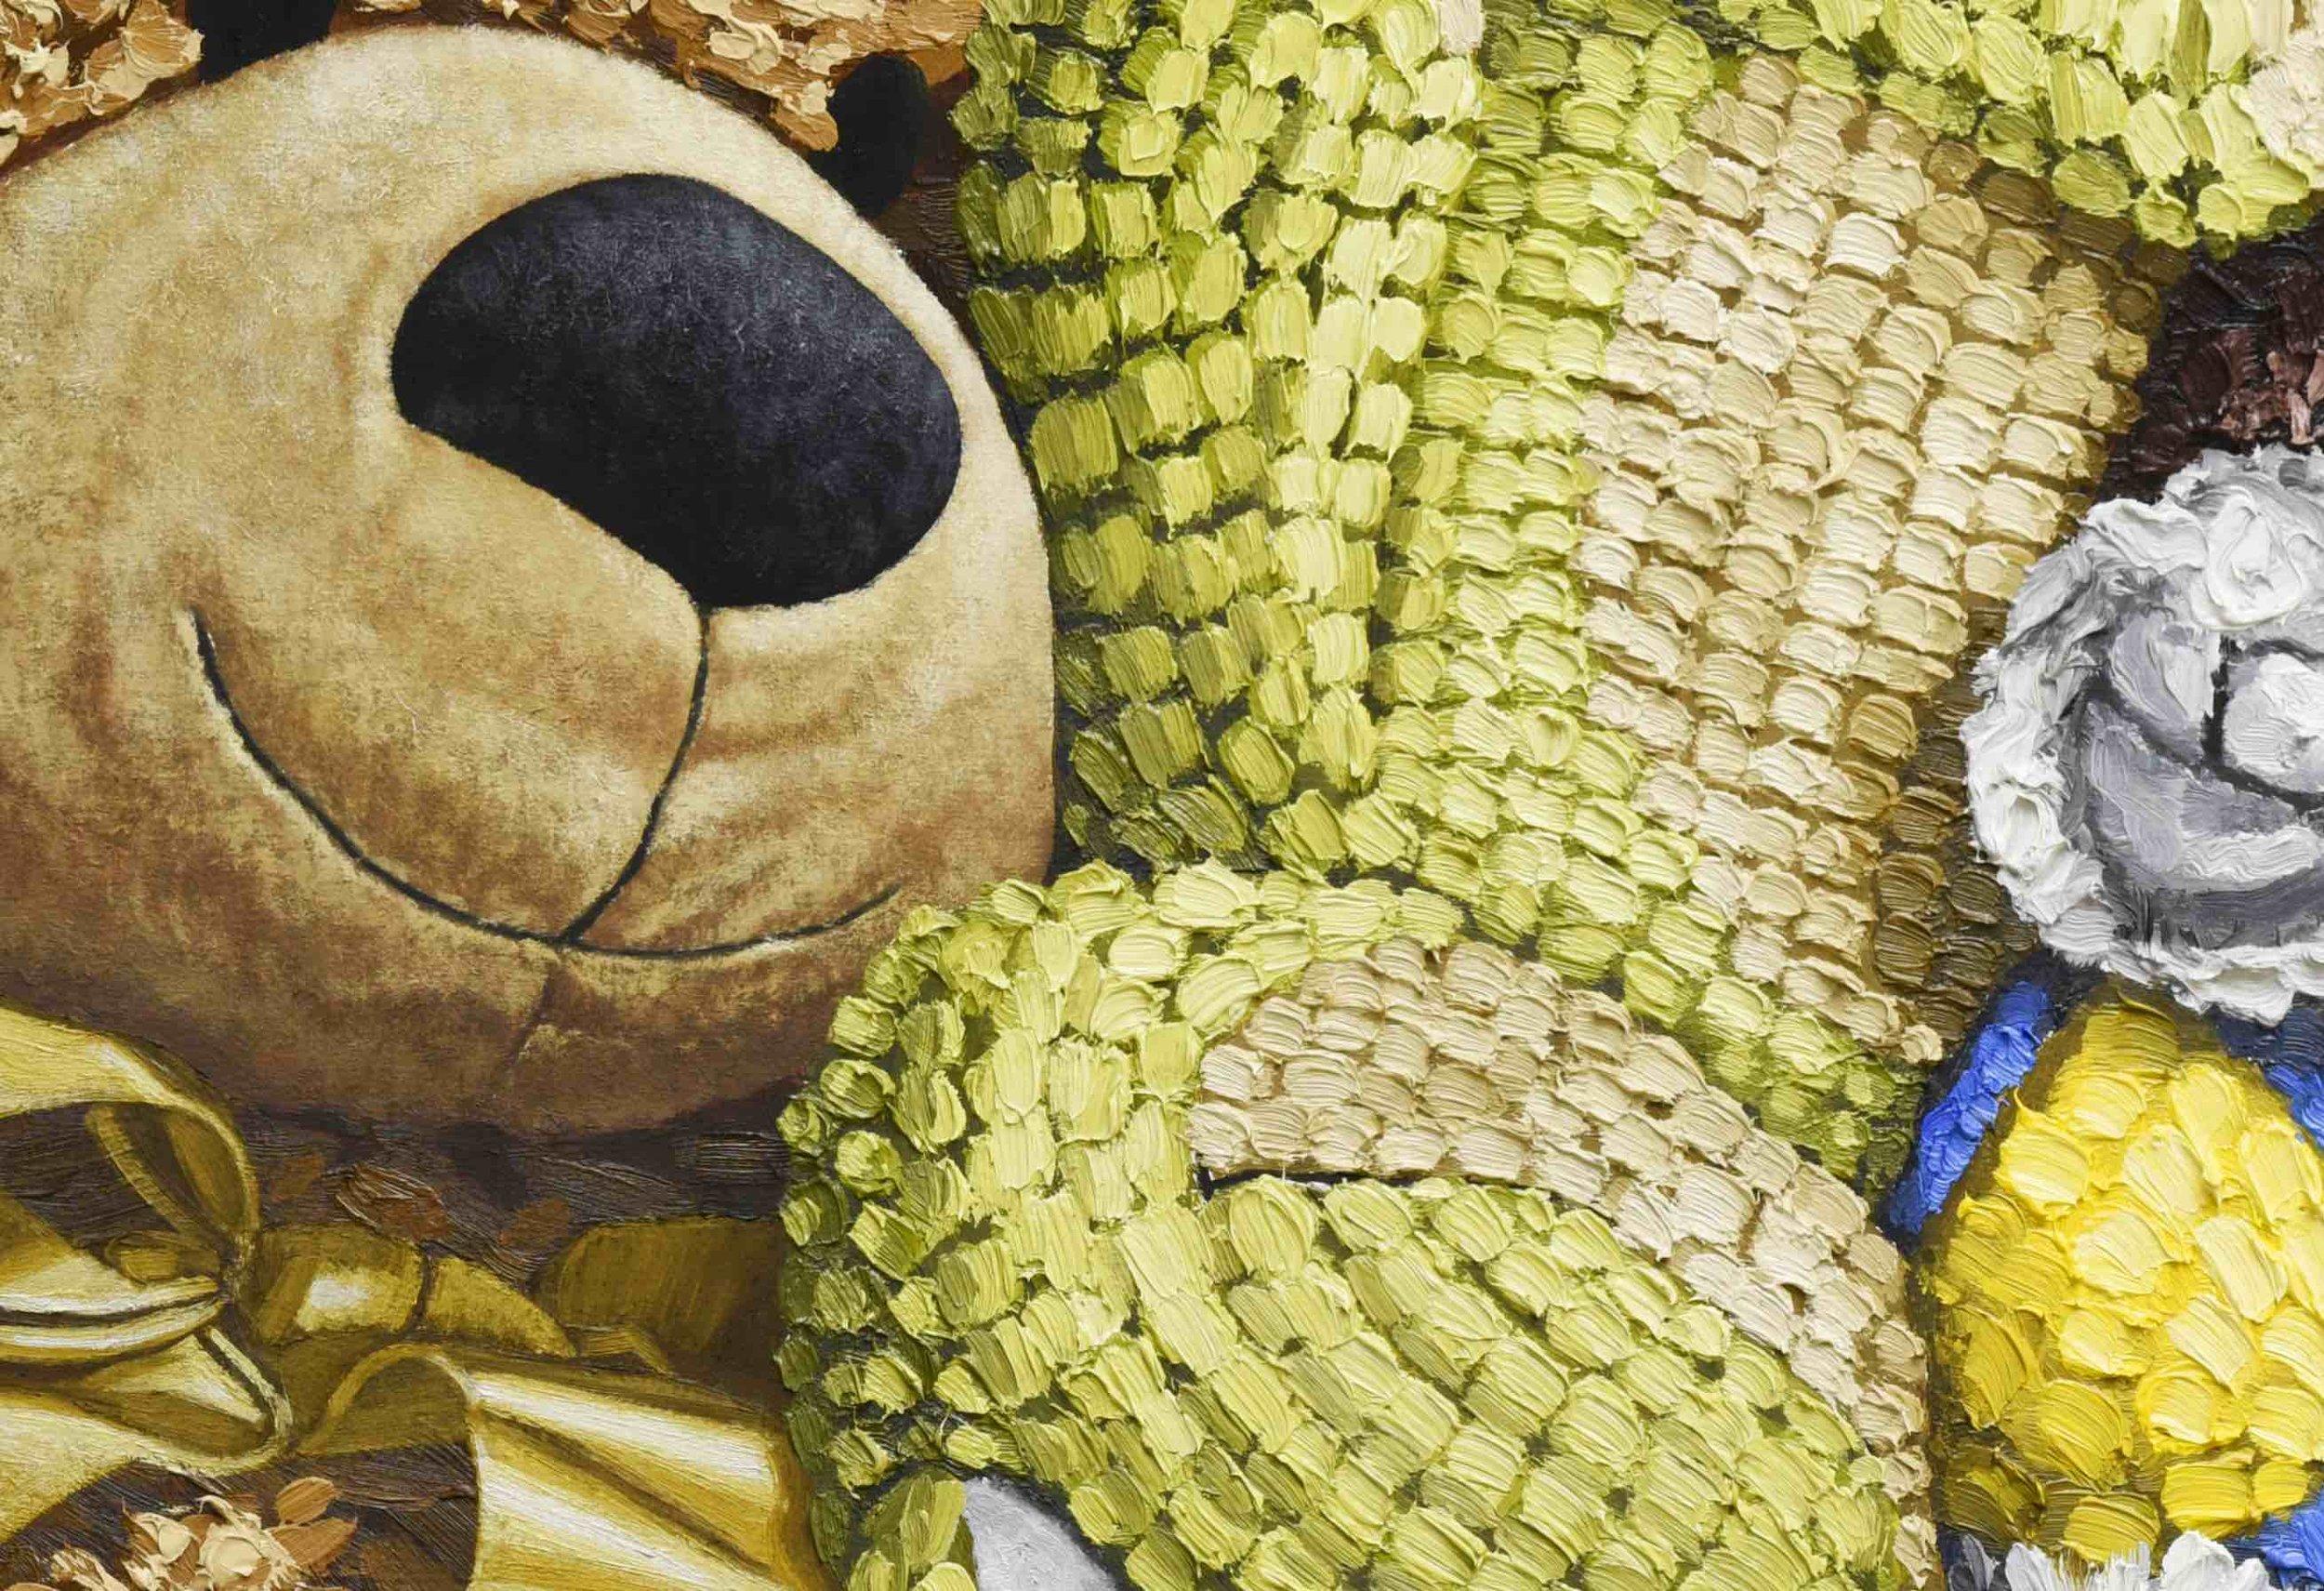 many-stuffed-animal-collage-painting-brent-estabrook-closeup2.jpg